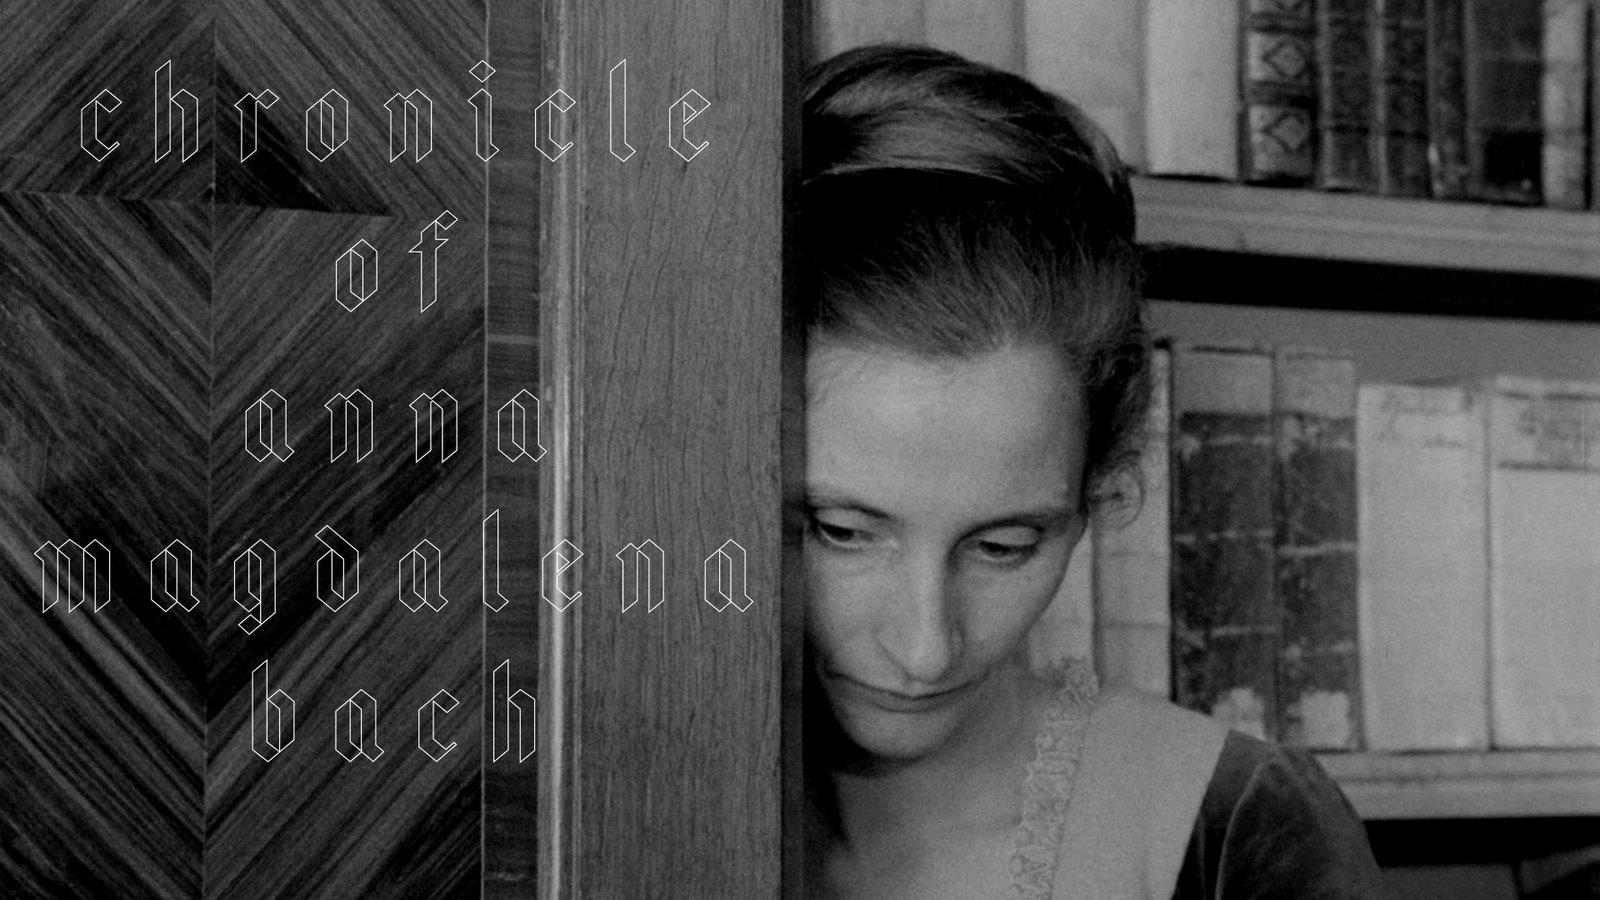 Chronicle of Anna Magdalena Bach - Chronik der Anna Magdalena Bach